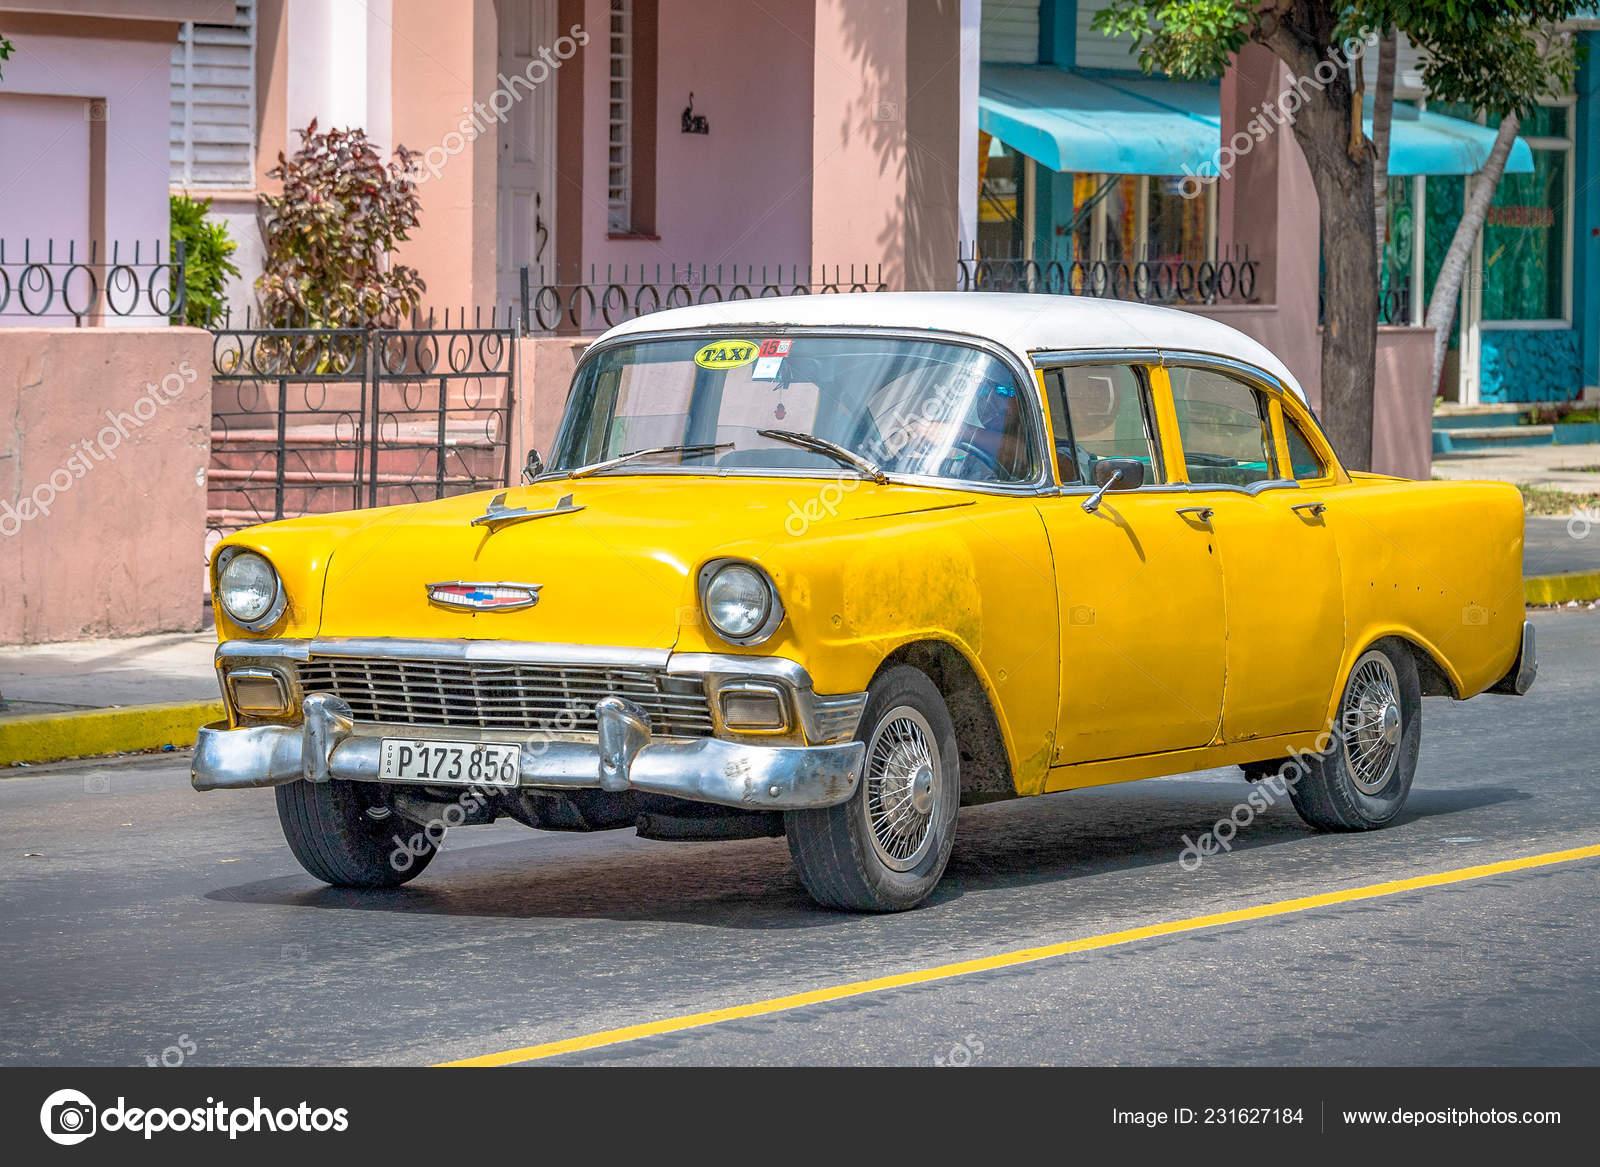 Varadero Matanzas Cuba September 2018 Cuban Old Cars Small Yellow